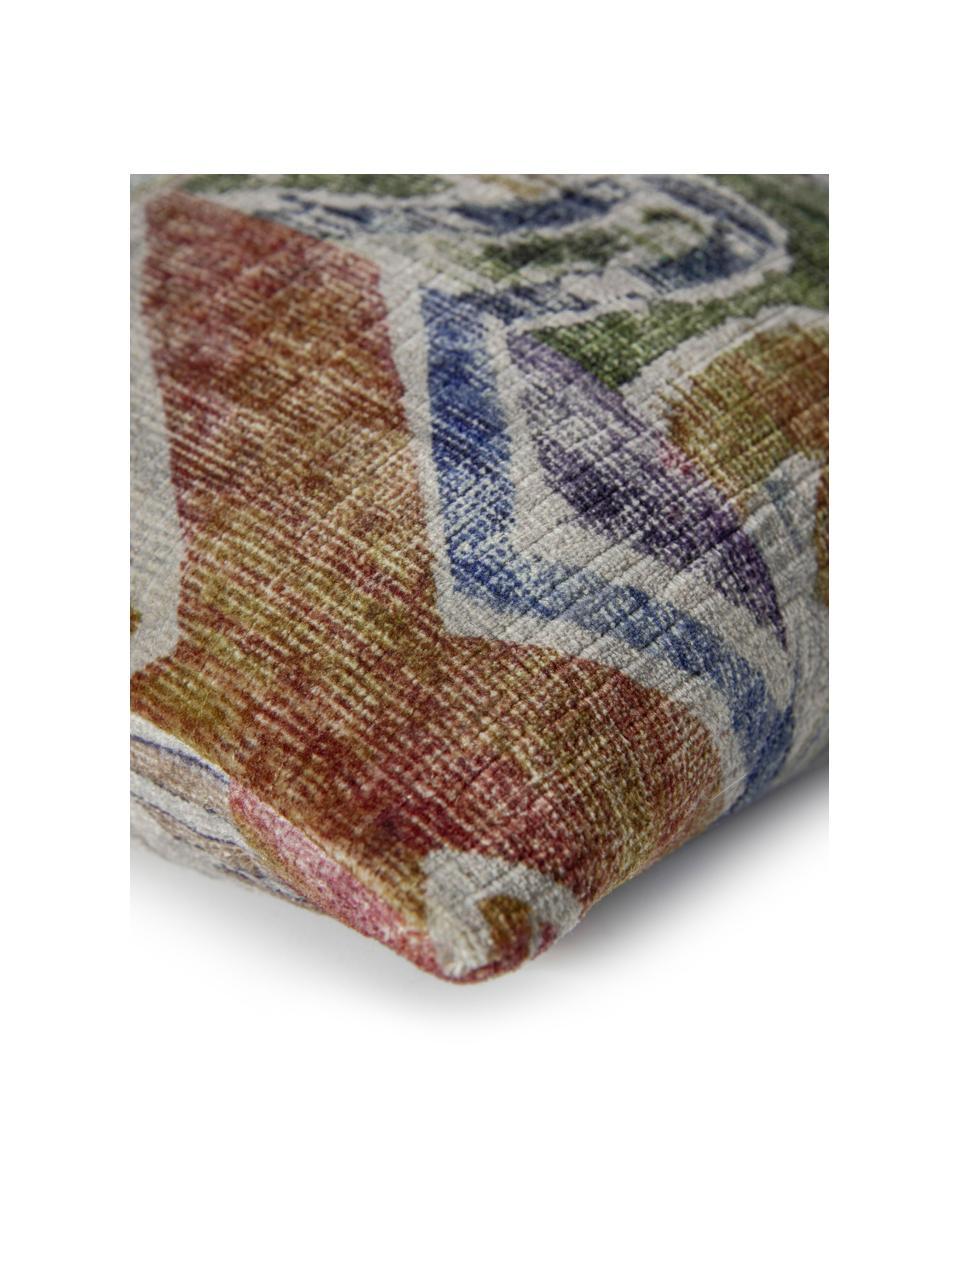 Samt-Kissenhülle Cosima mit buntem Ethno-Muster, 100% Polyestersamt, Weinrot, Mehrfarbig, 40 x 40 cm